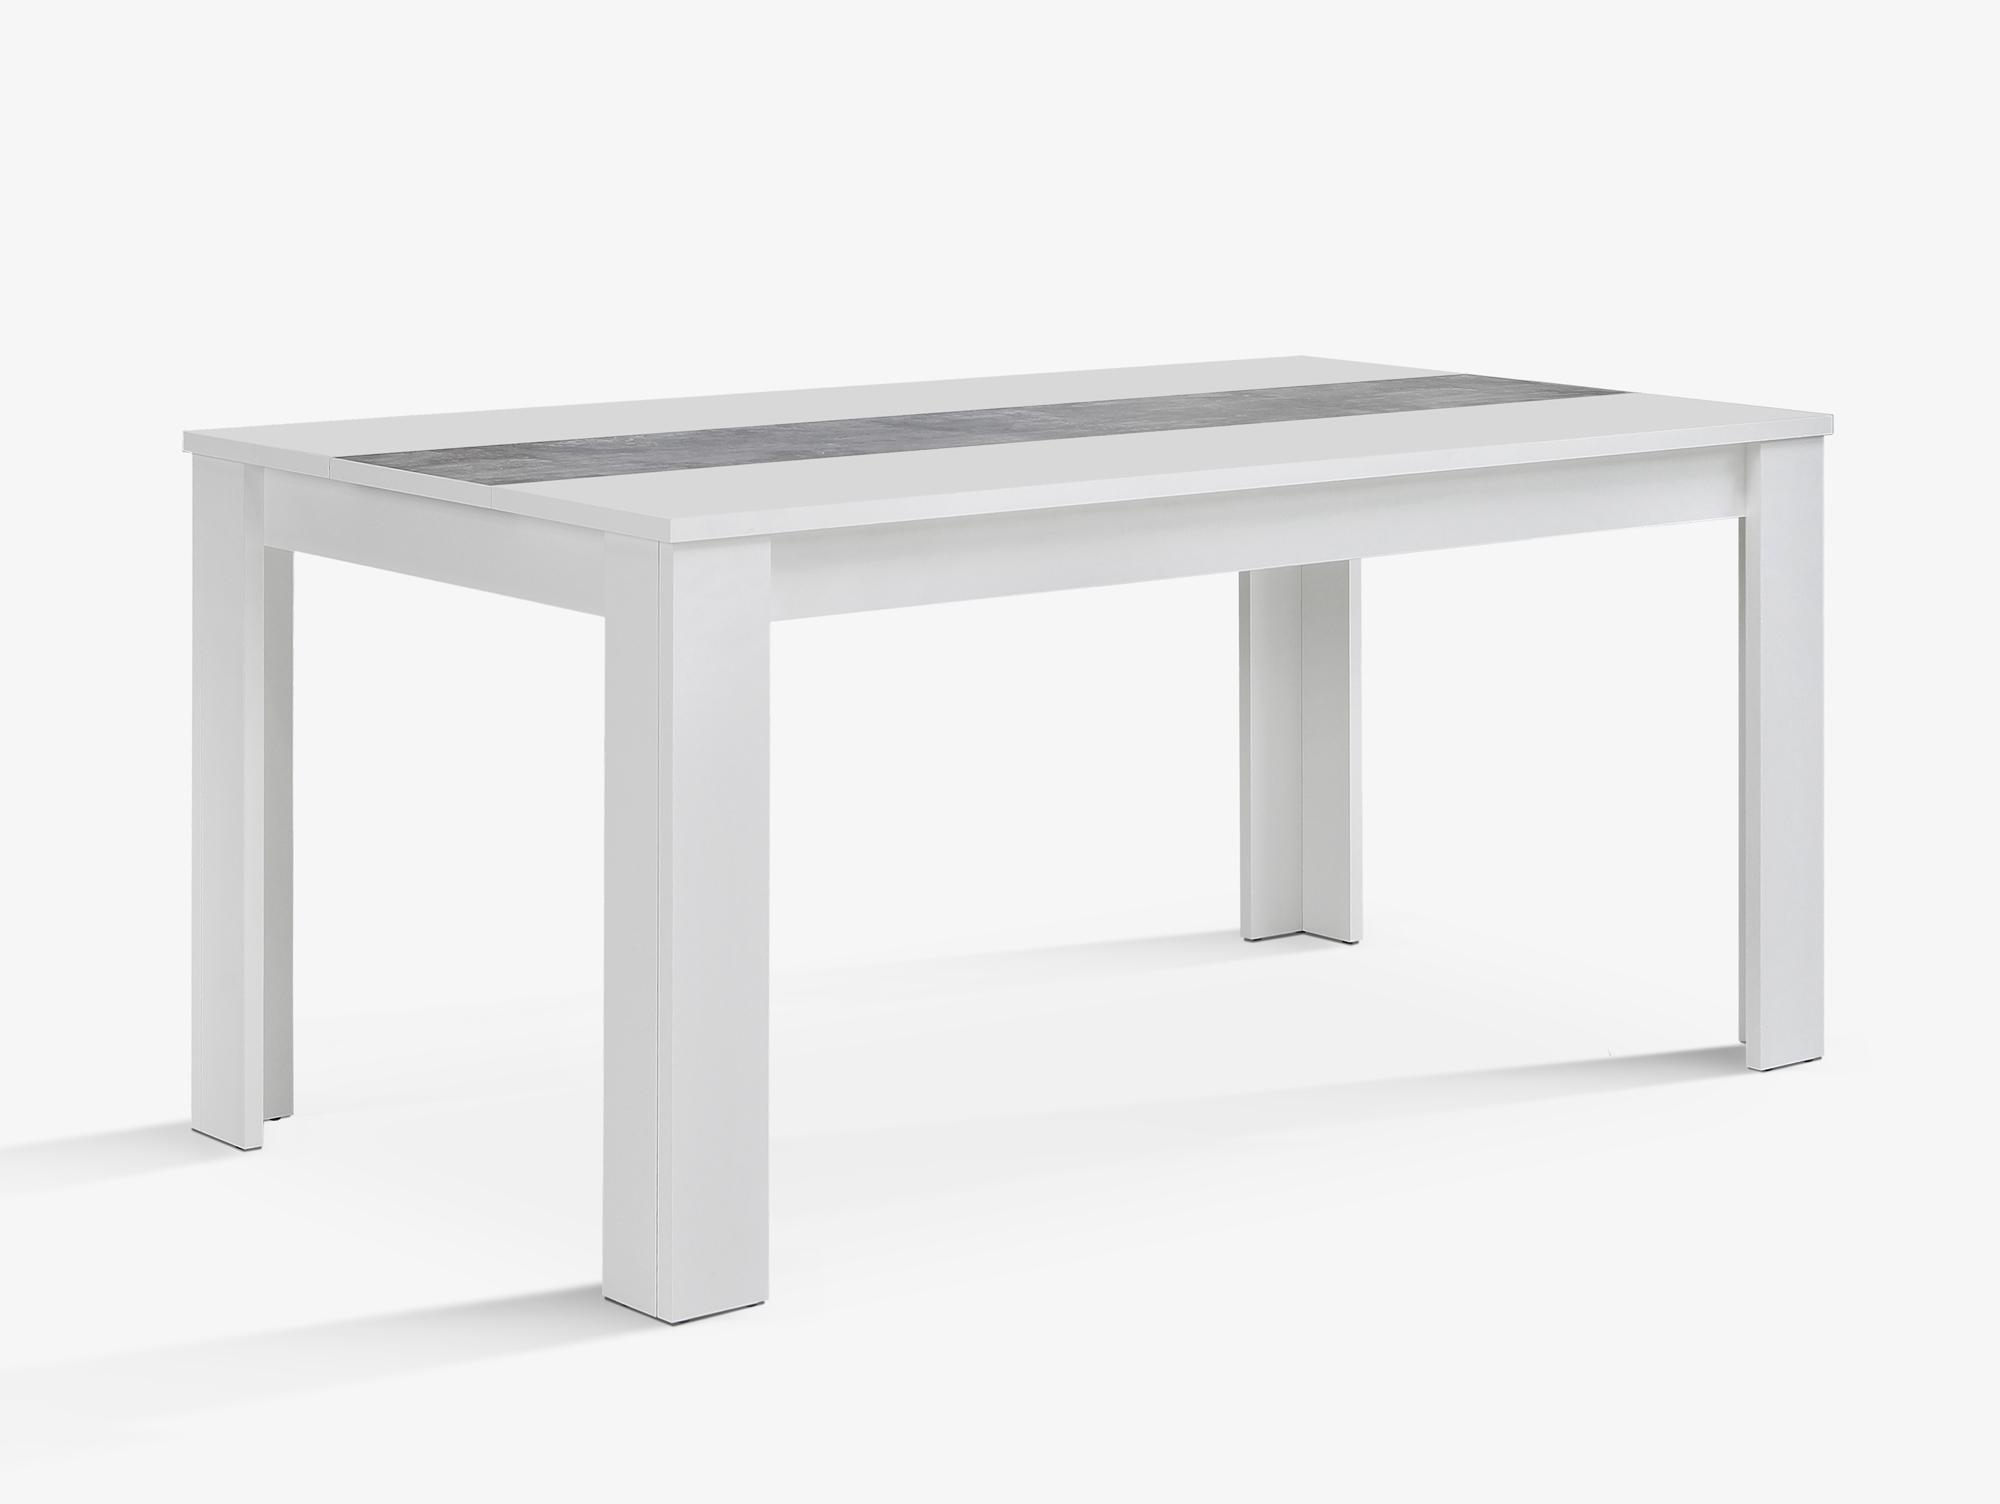 EMARA Esstisch 160x90 cm, Material Dekorspanplatte, weiss / betonfarbig